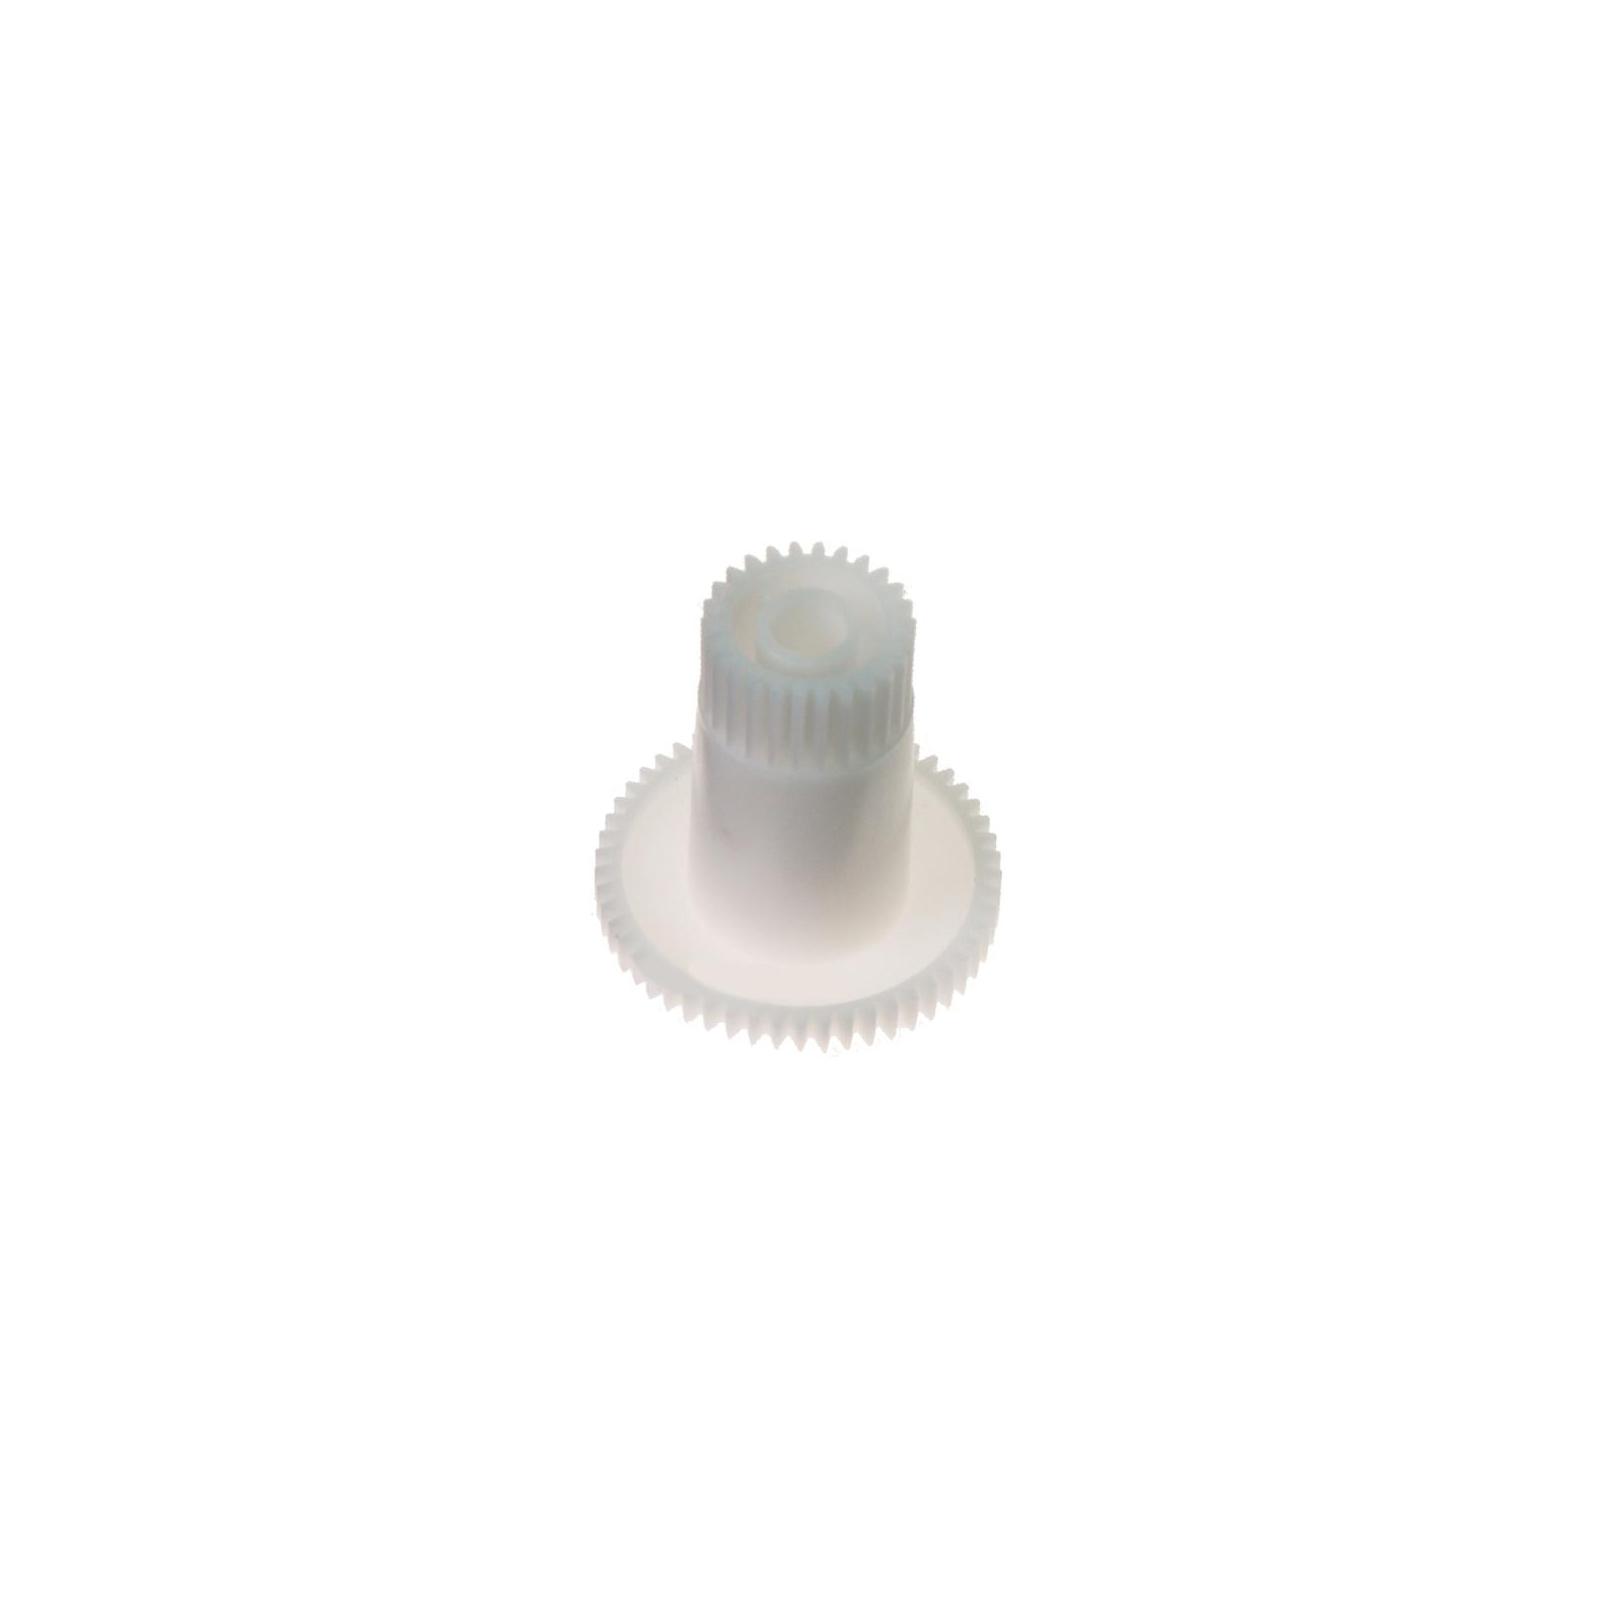 Шестерня редуктора Samsung ML-1710/1750, 53/26Т аналог JC66-00388A BASF (WWMID-74637)